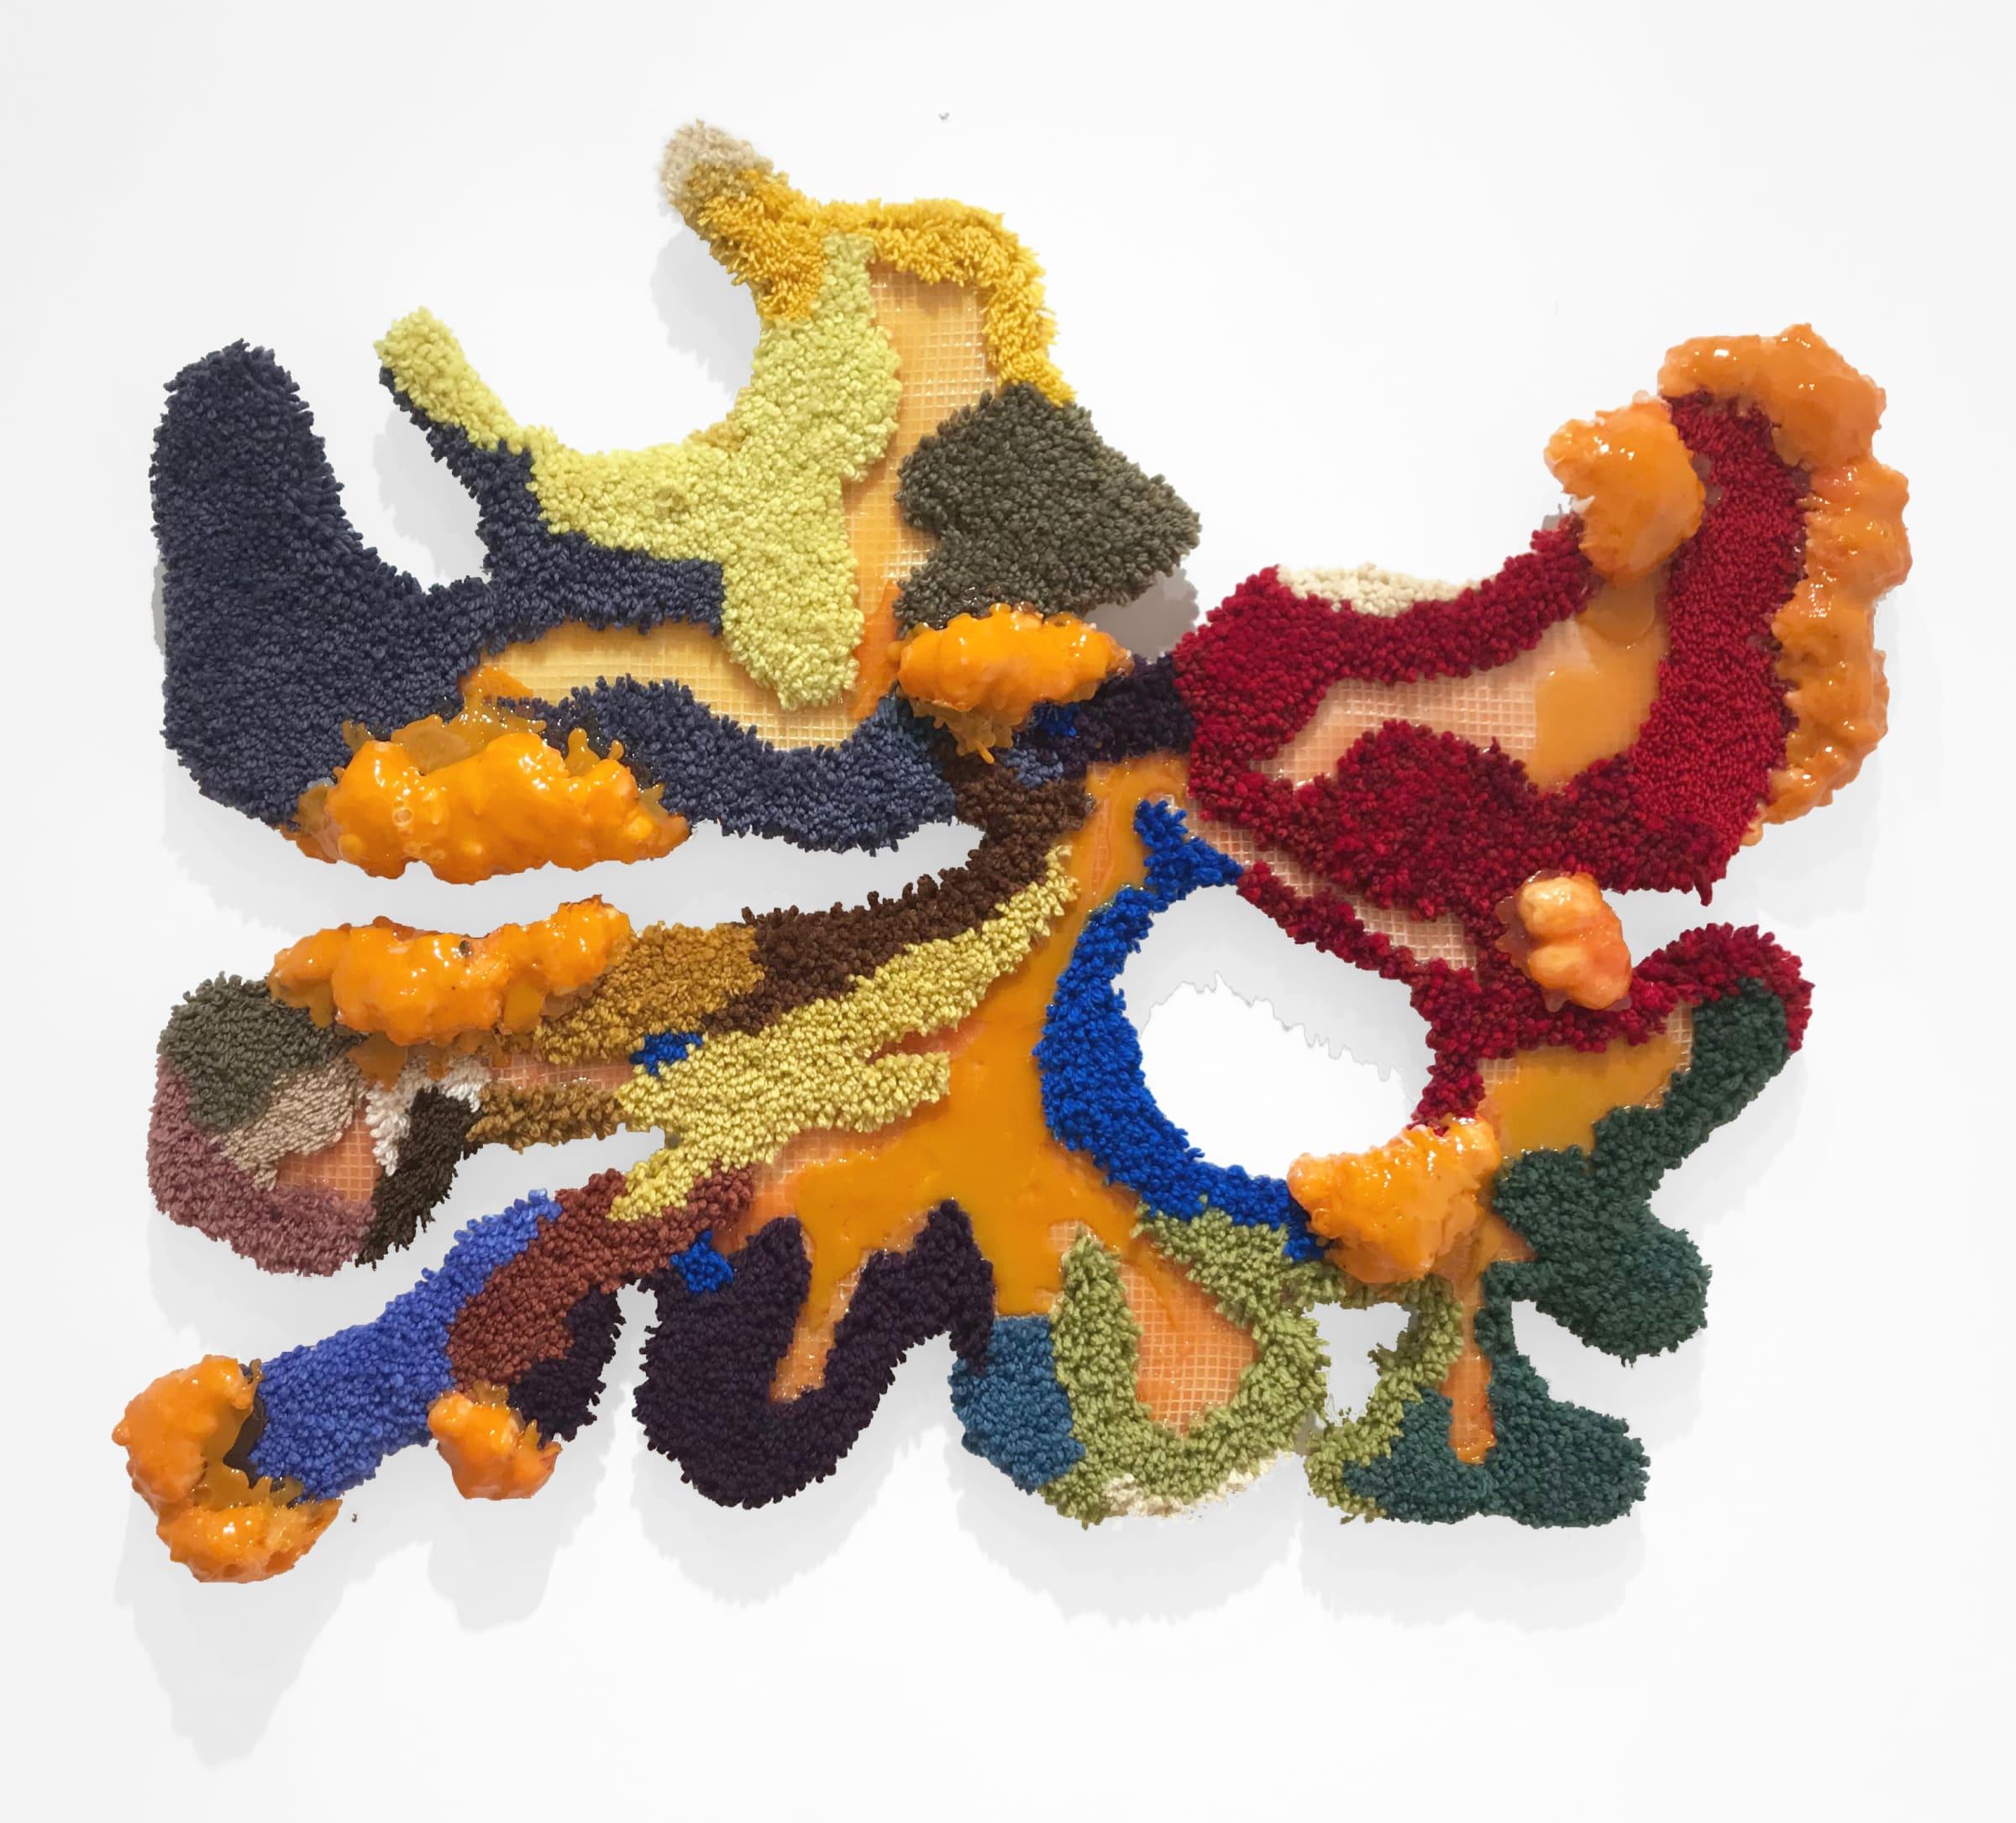 "<span class=""link fancybox-details-link""><a href=""/artists/79-marianne-thoermer/works/1052-marianne-thoermer-internal-landscape-ii-2019/"">View Detail Page</a></span><div class=""artist""><strong>Marianne Thoermer</strong></div> <div class=""title""><em>Internal landscape II</em>, 2019</div> <div class=""medium"">Glasswax, mdf board, wool, rug canvas, expanding foam</div> <div class=""dimensions"">122 x 130 x 13cms</div>"